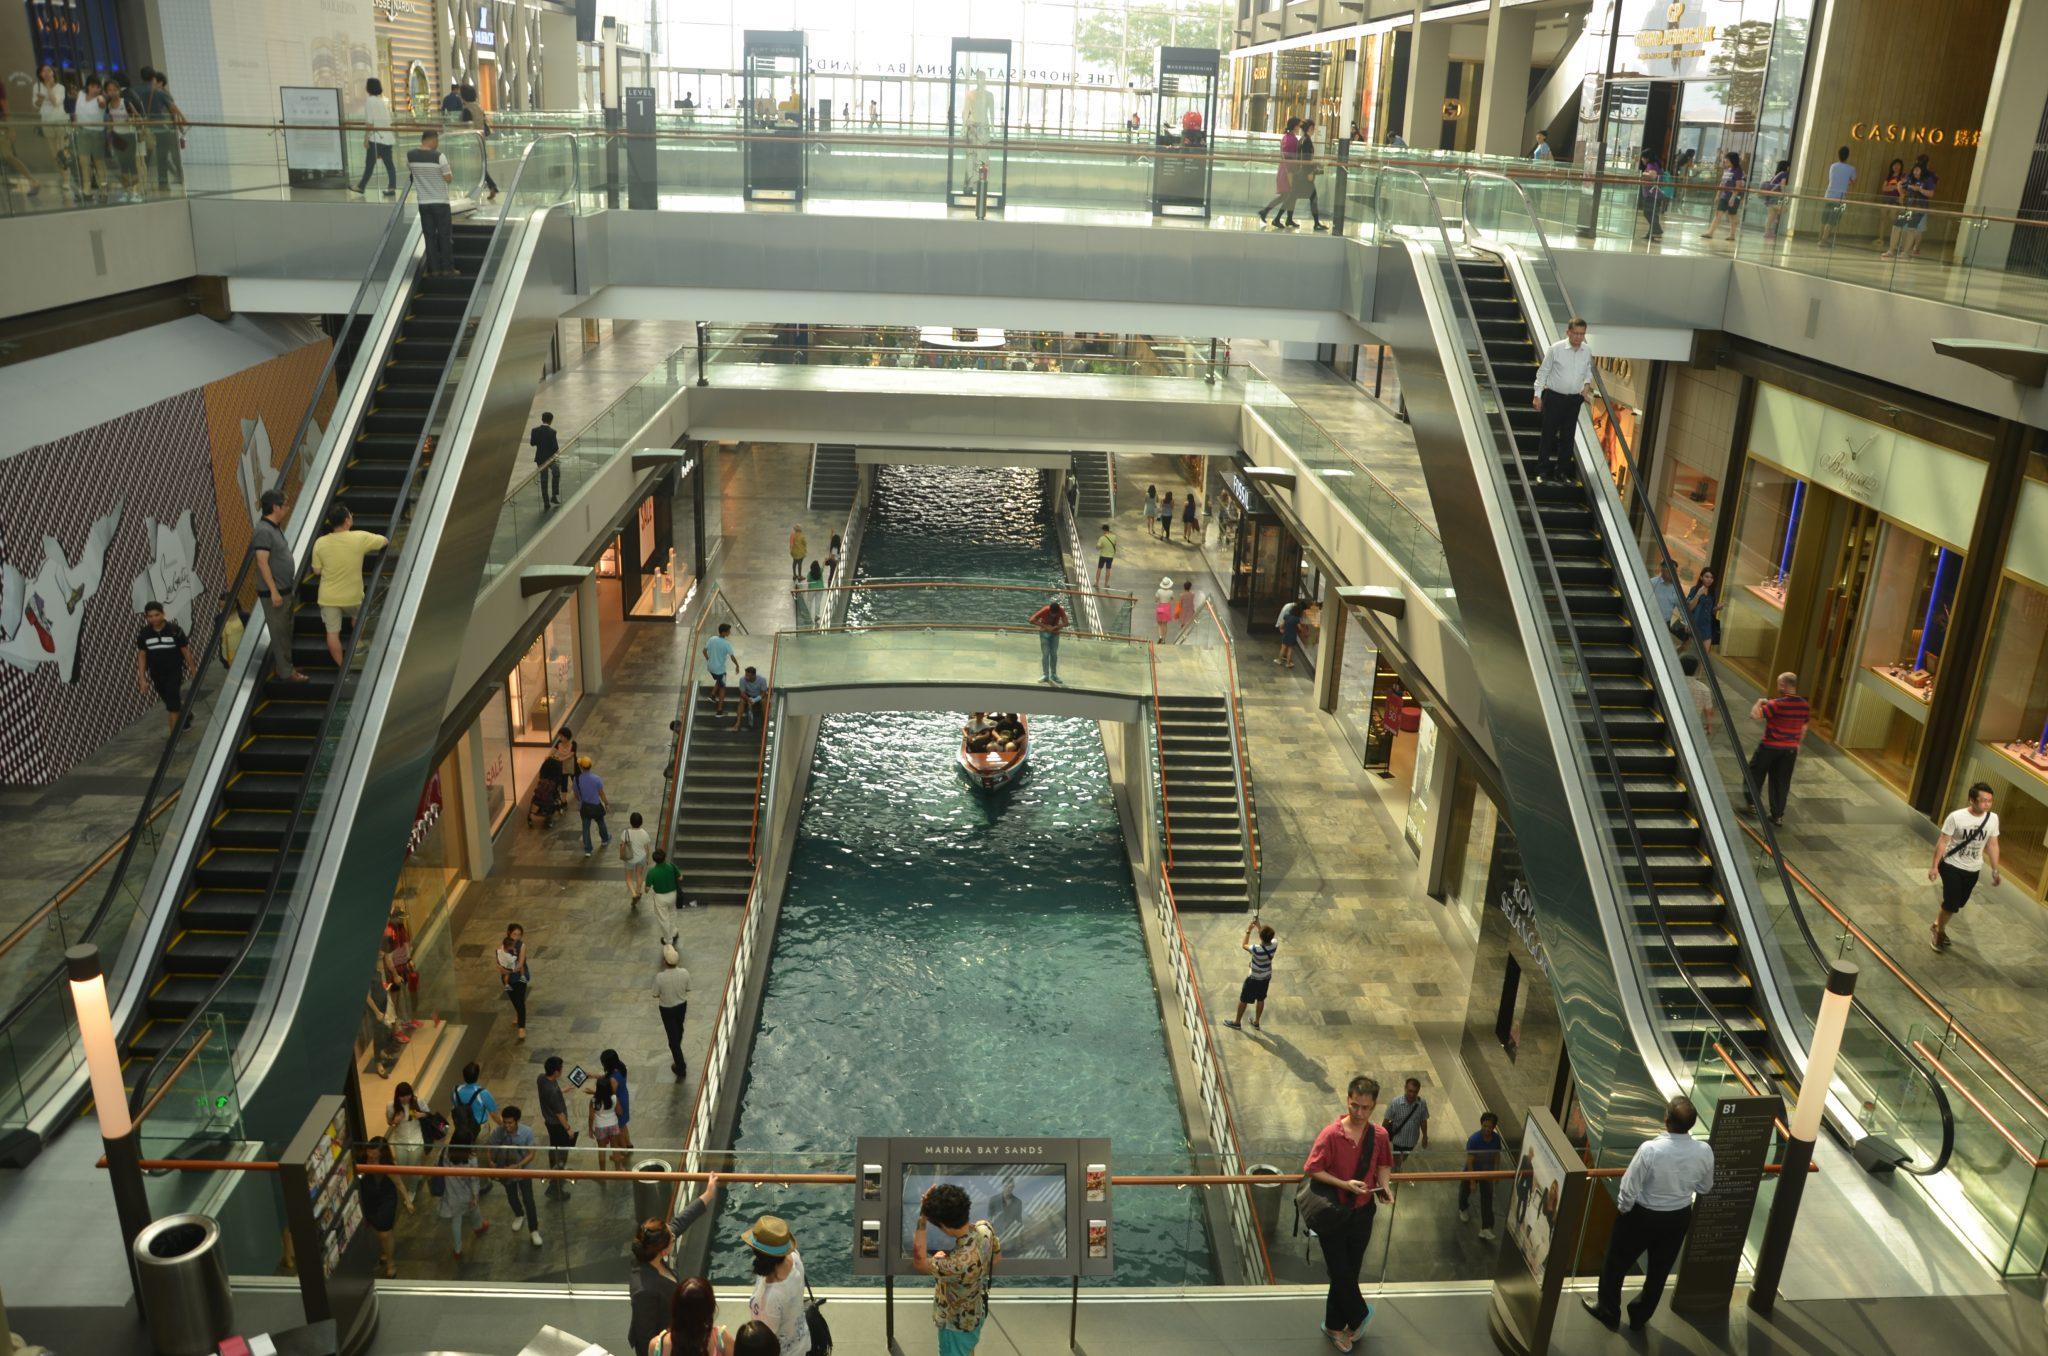 Marina Bay shopping centre